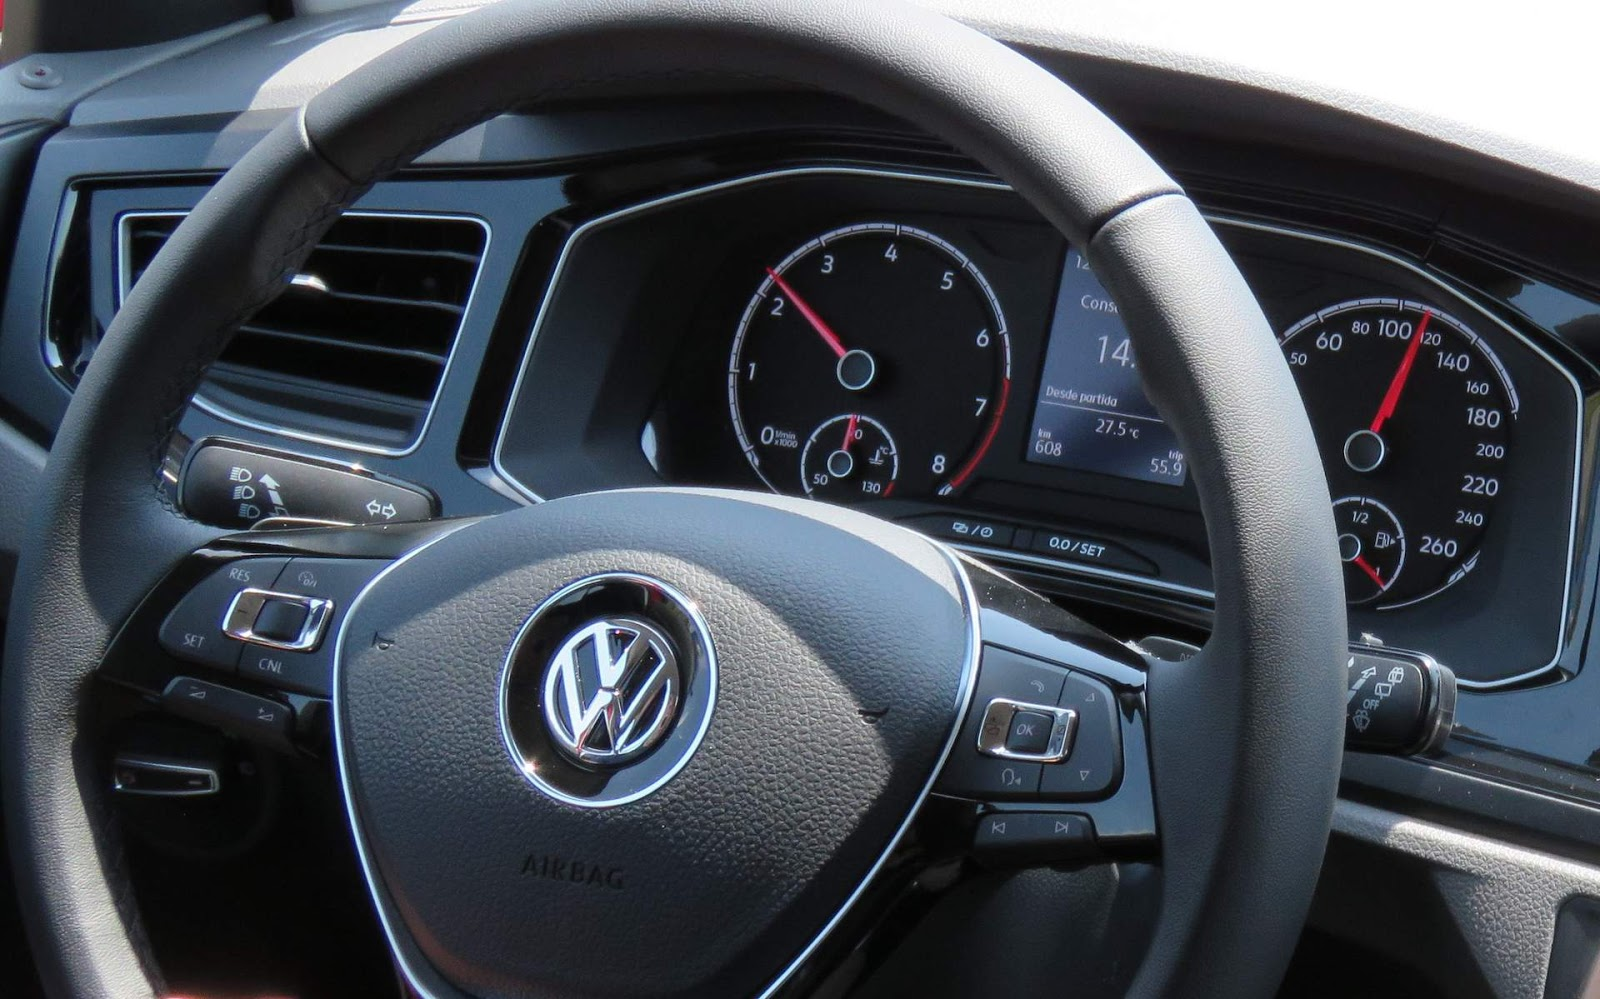 a040facaa9 Volkswagen Polo 200 TSI Comfortline  impressões ao dirigir